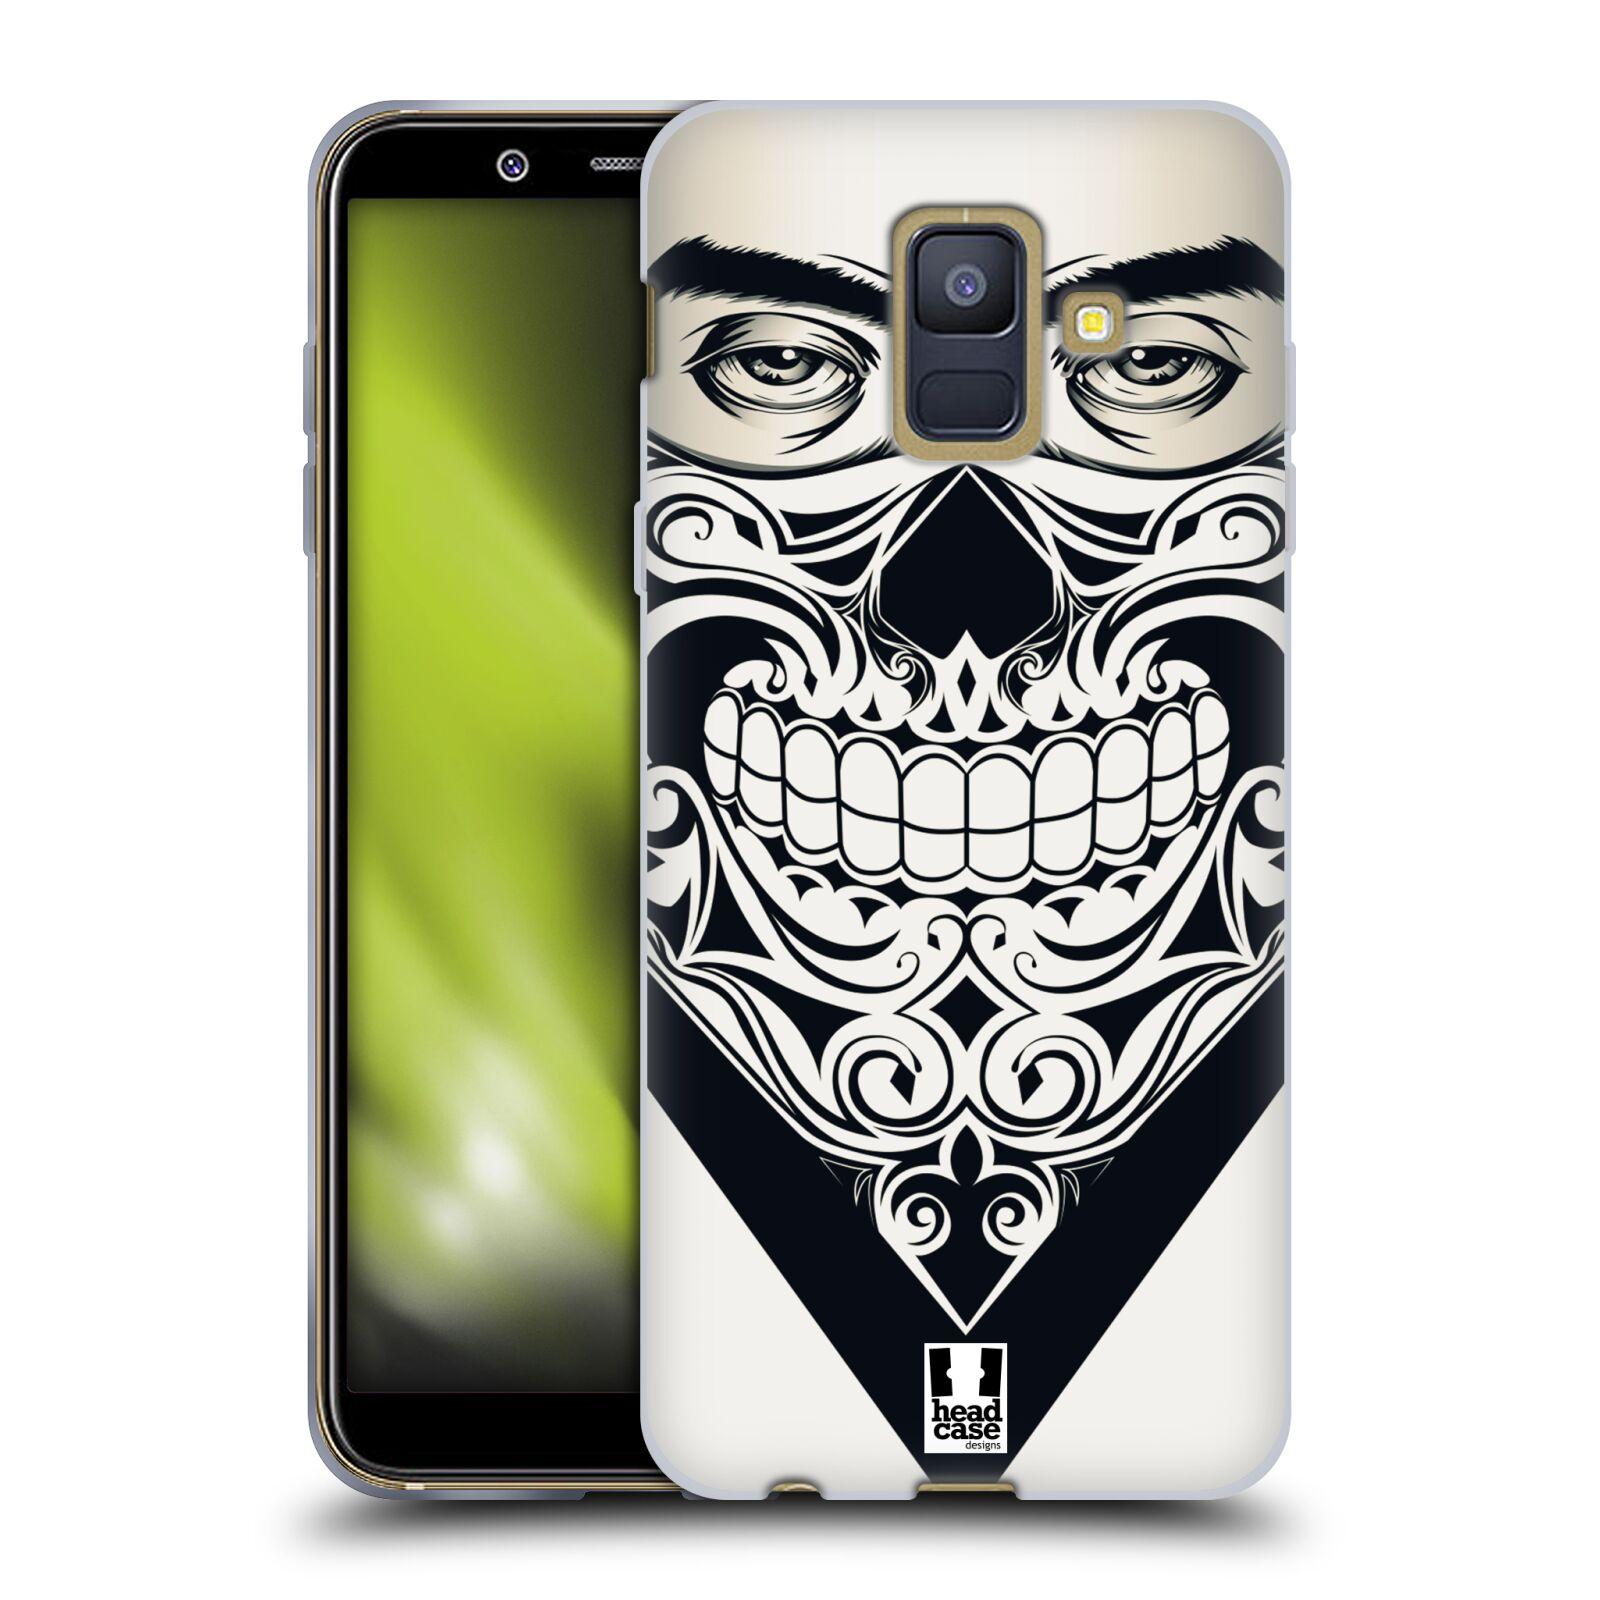 Silikonové pouzdro na mobil Samsung Galaxy A6 (2018) - Head Case - LEBKA BANDANA